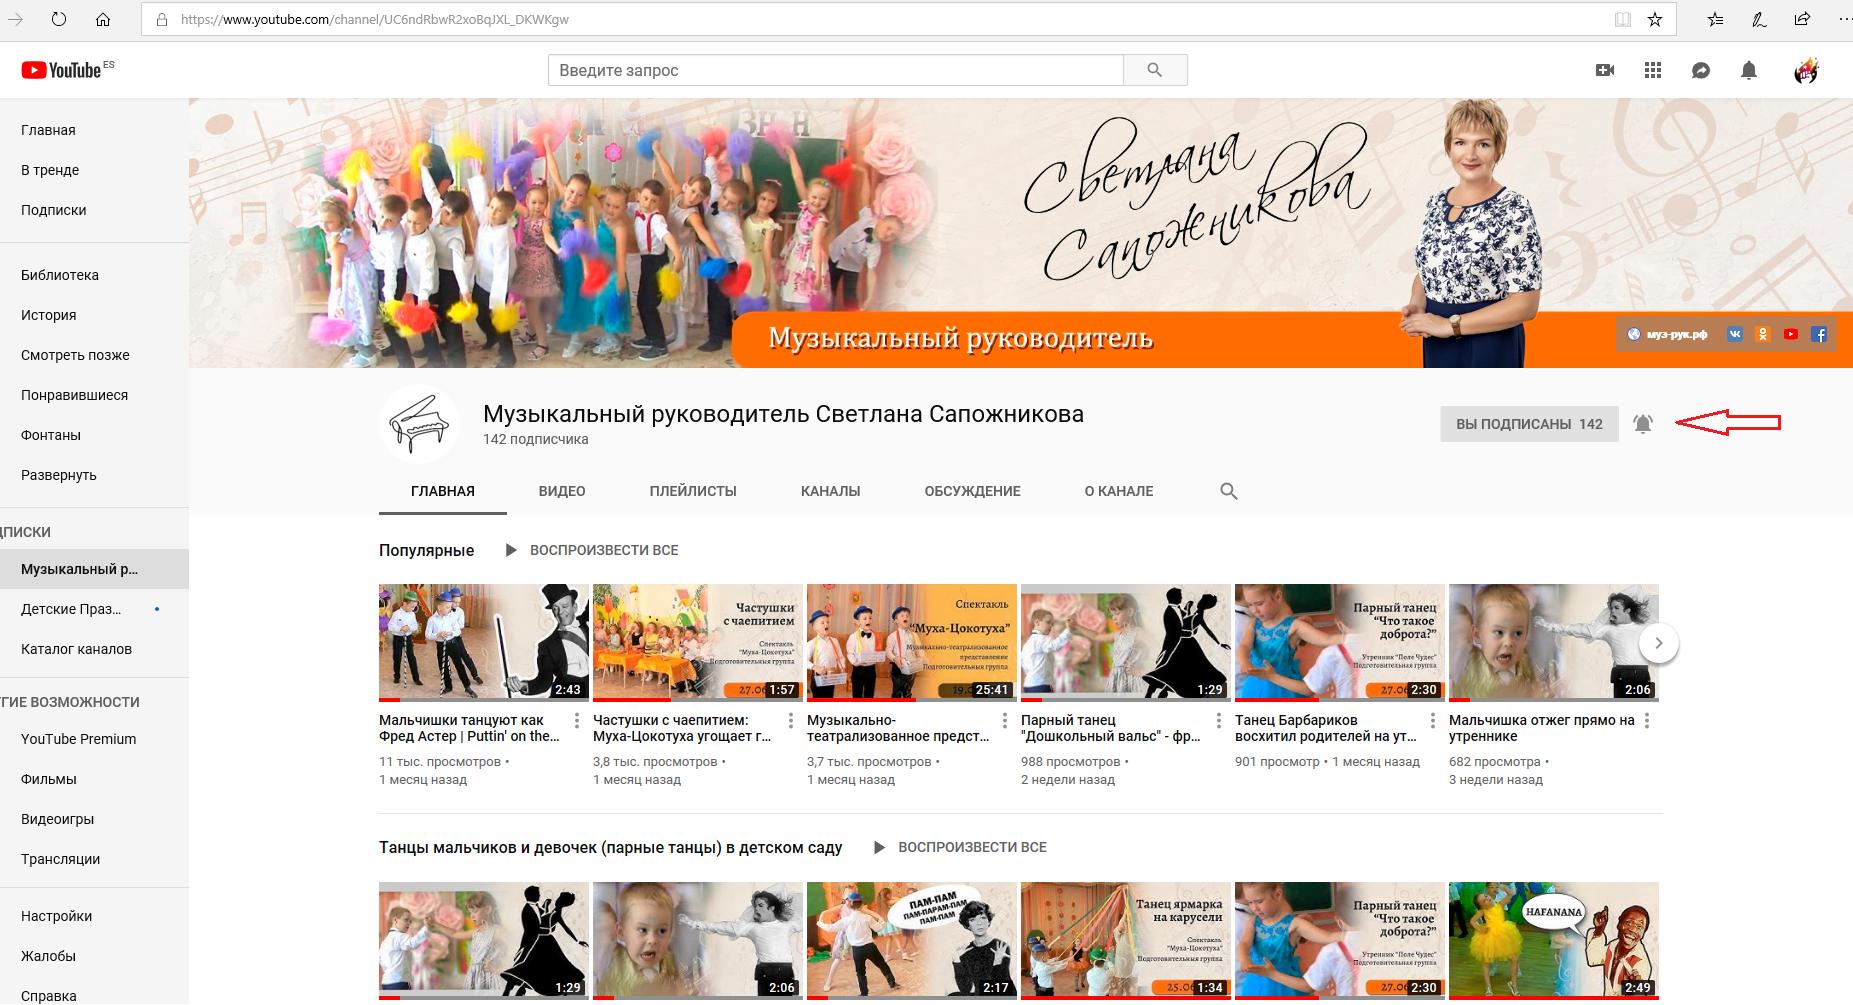 Колокольчик подписки на YouTube канал